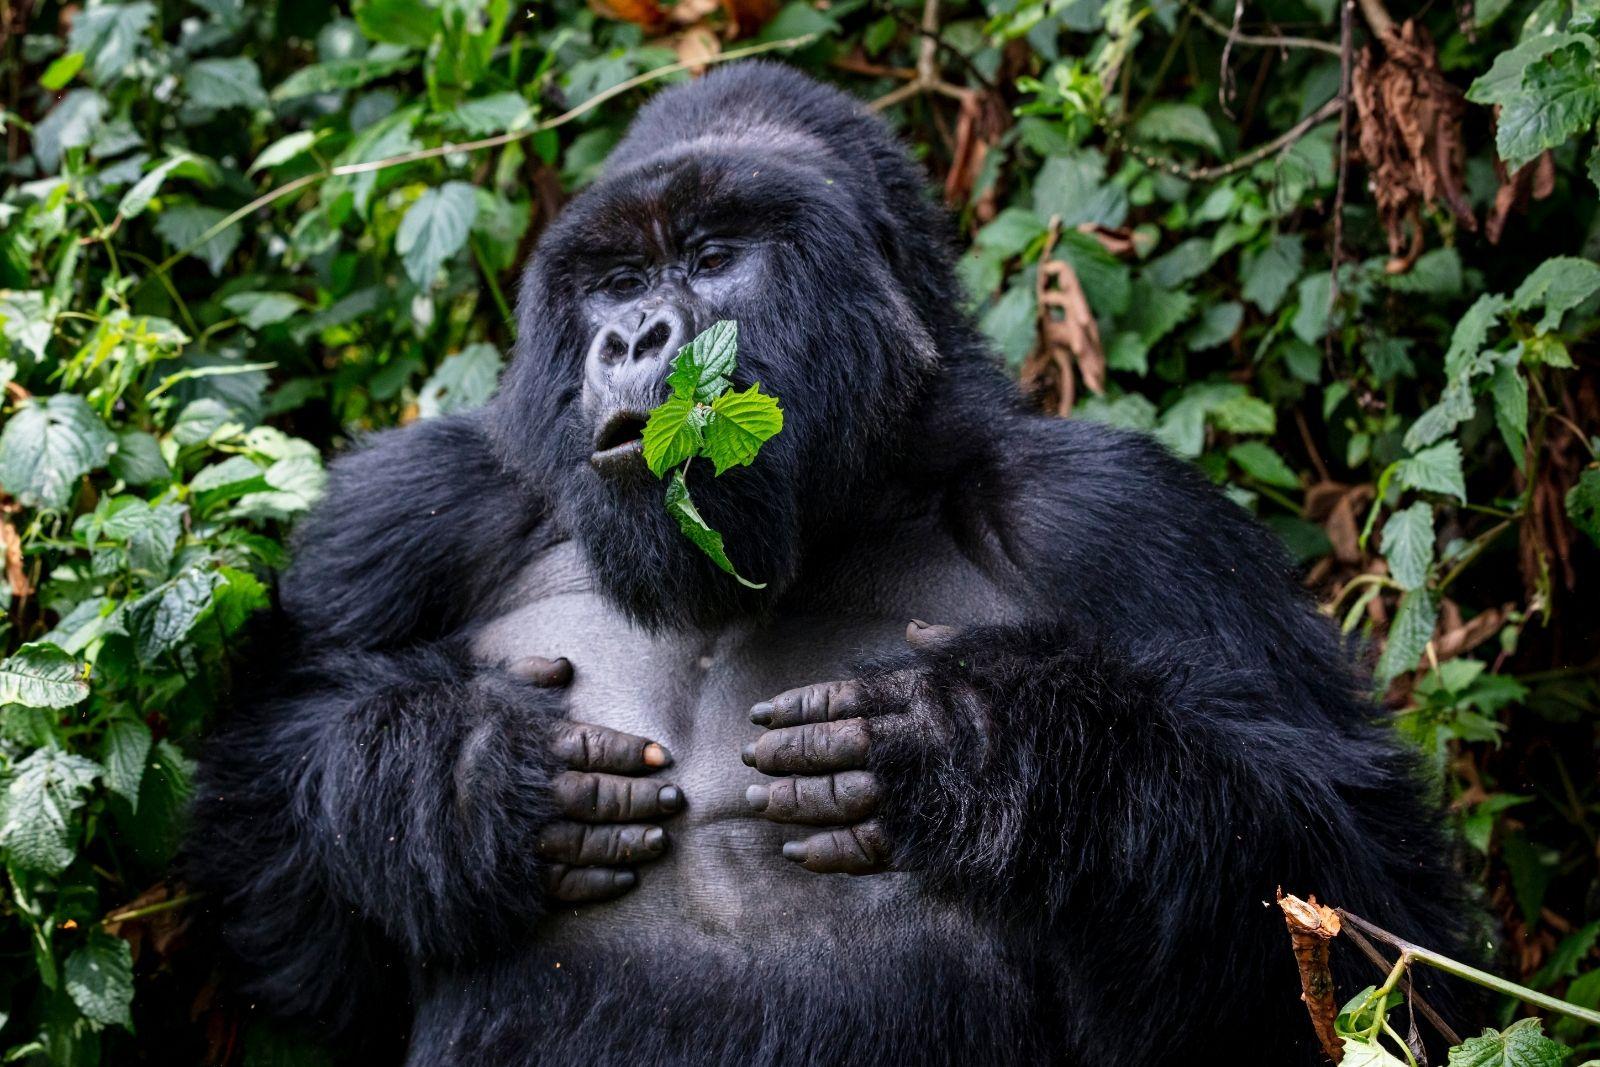 Day 3: Gorilla Trekking Adventure in Bwindi